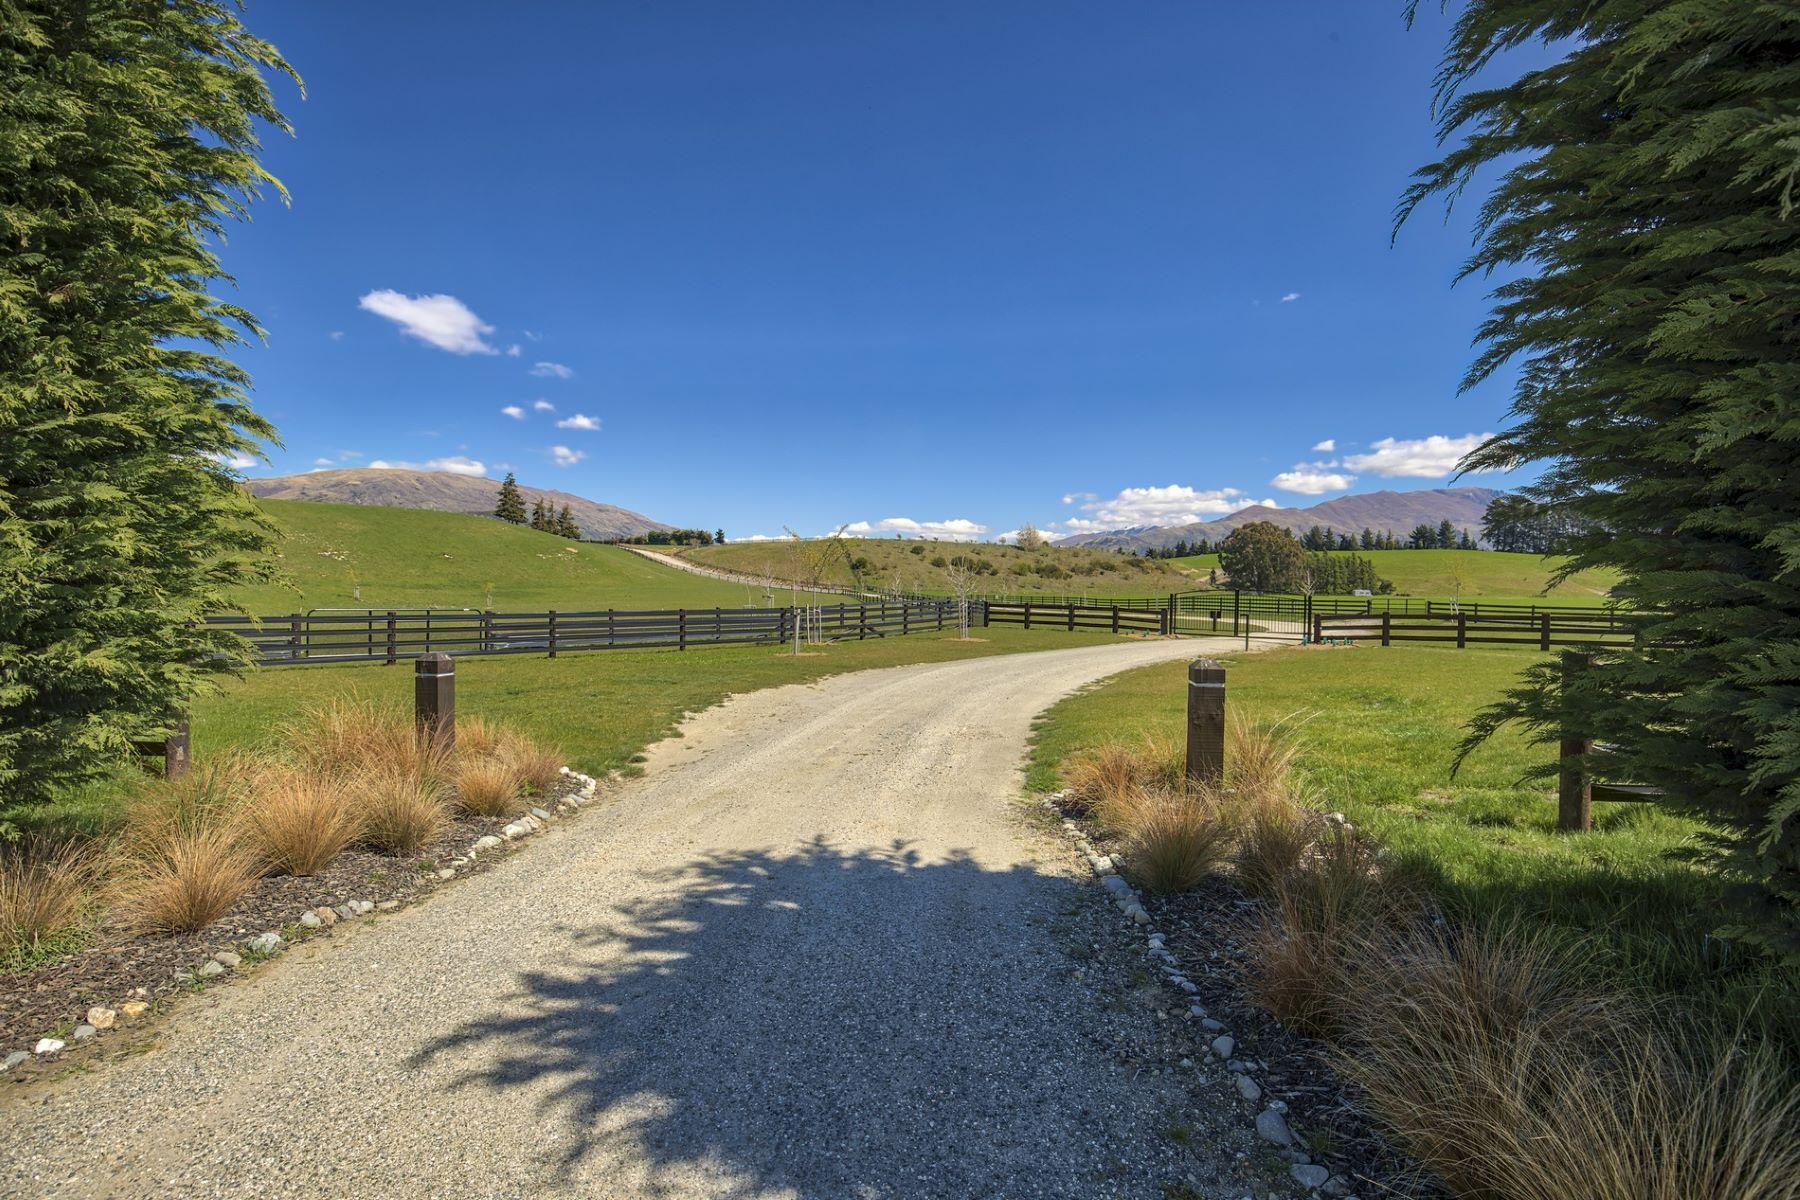 Ferme / Ranch / Plantation pour l Vente à Prestigious Rural Property 474 Wanaka - Luggate Highway Wanaka, Otago 9305 Nouvelle-Zélande